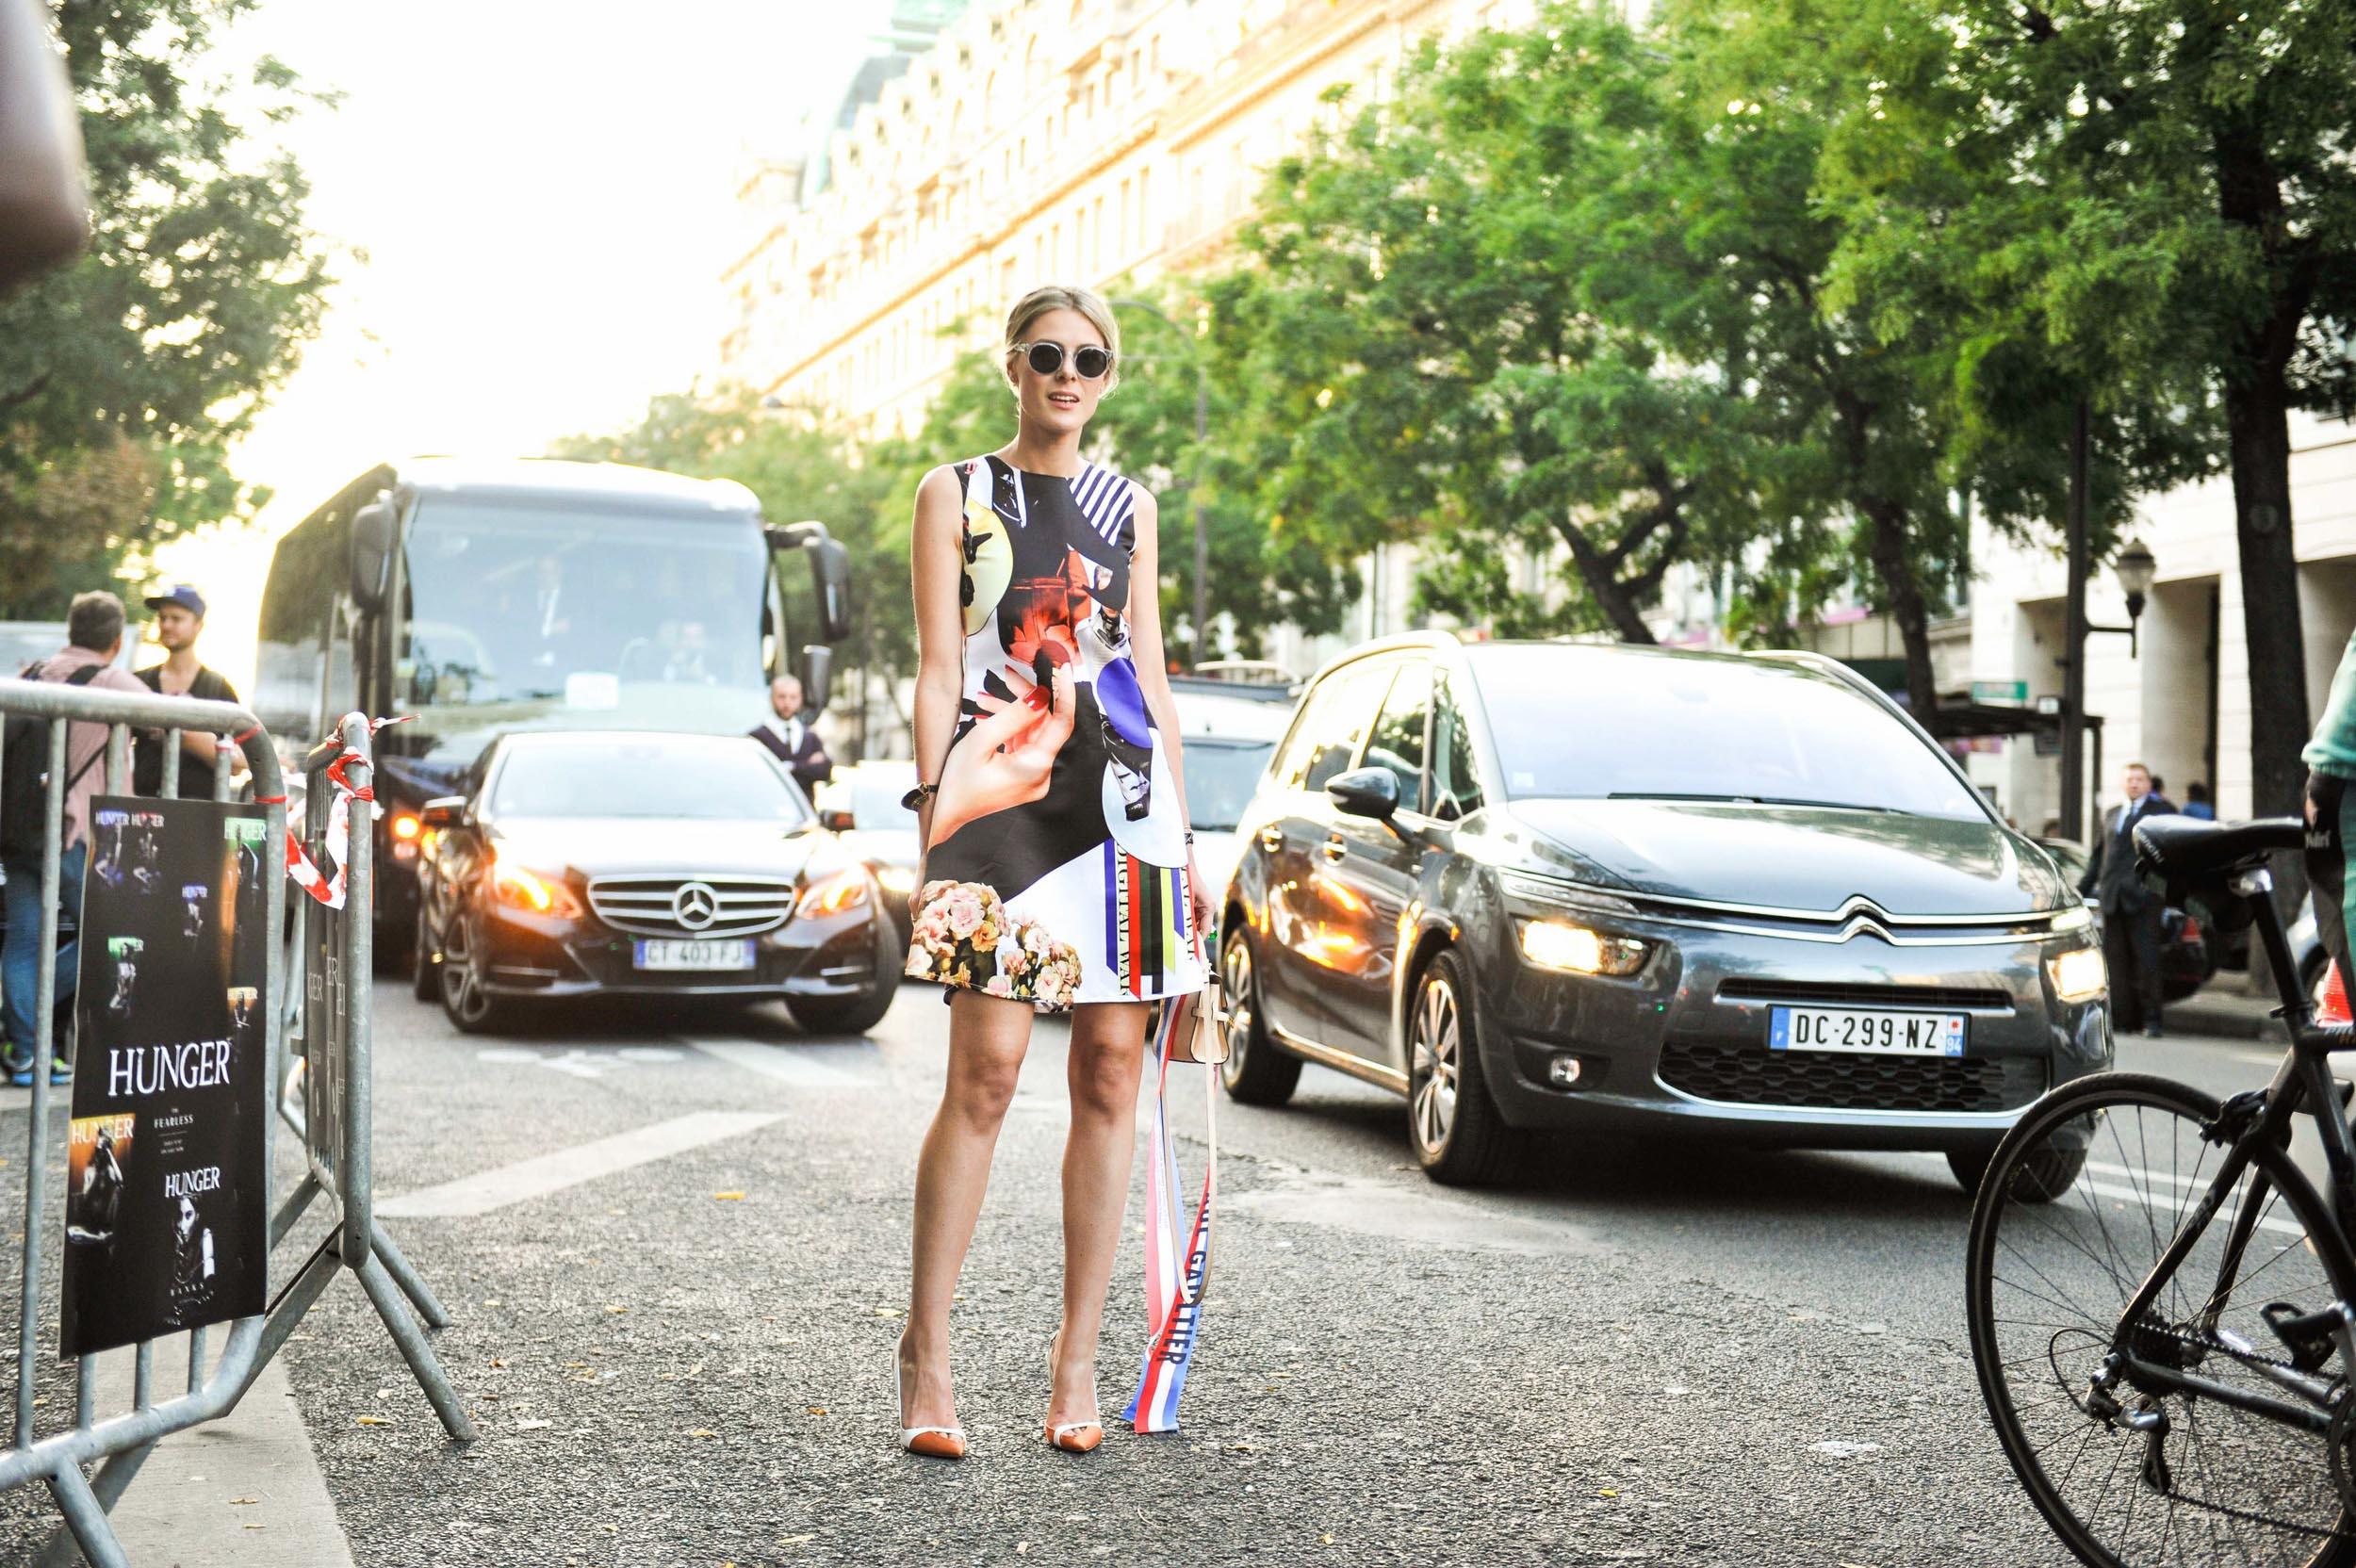 StreetStyle_ParisFashionWeek_LeandroJusten_127.jpg